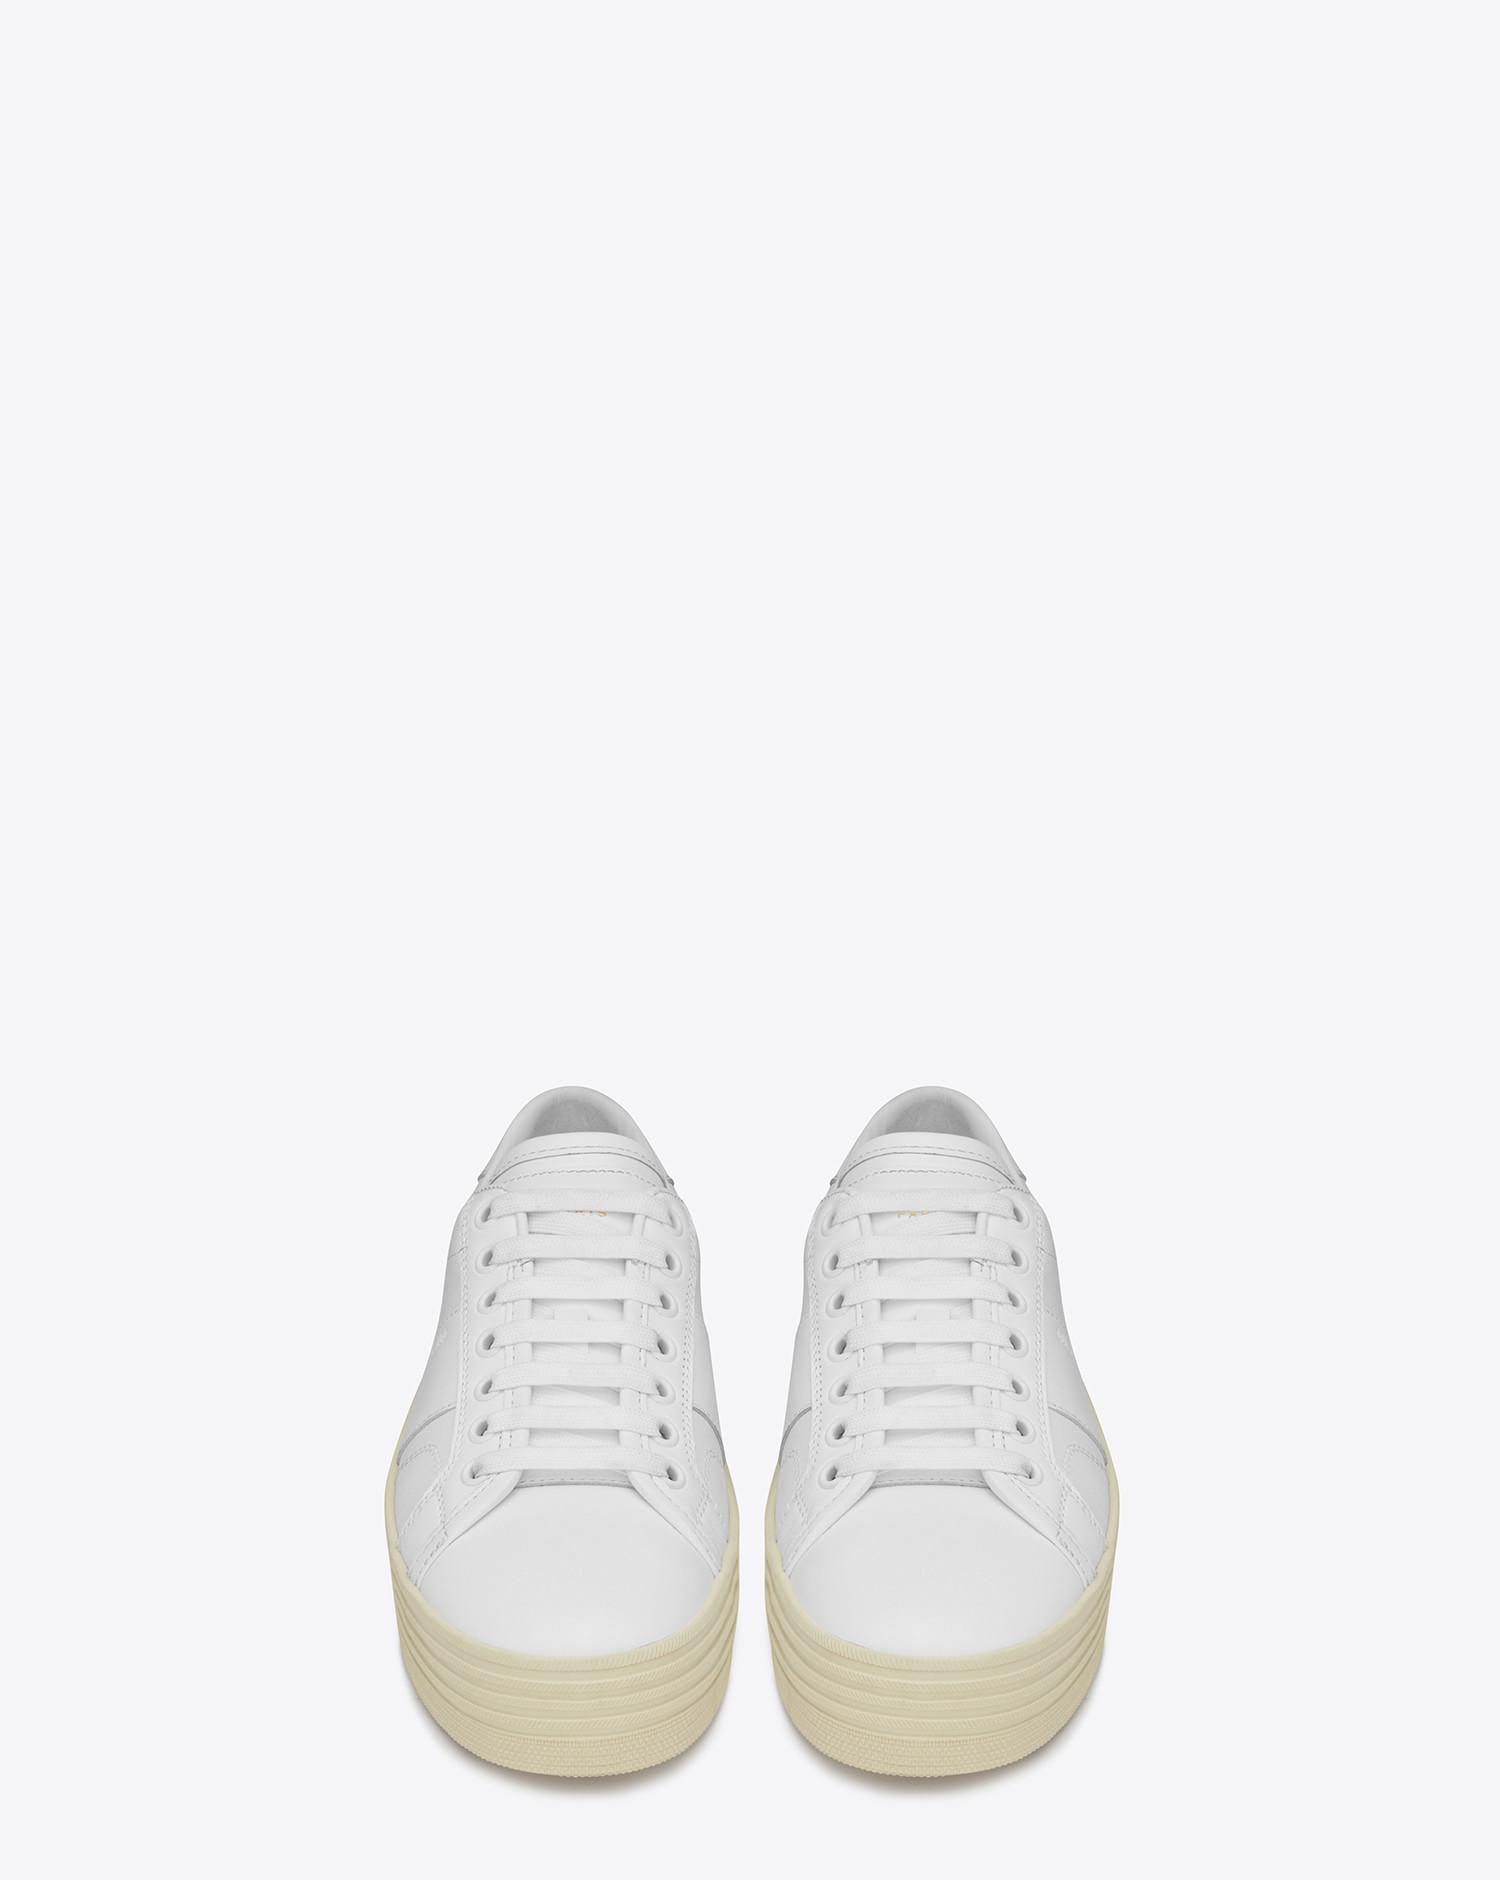 8207c707fa0 Lyst - Saint Laurent Signature Court Classic Sl 39 Platform Sneaker ...